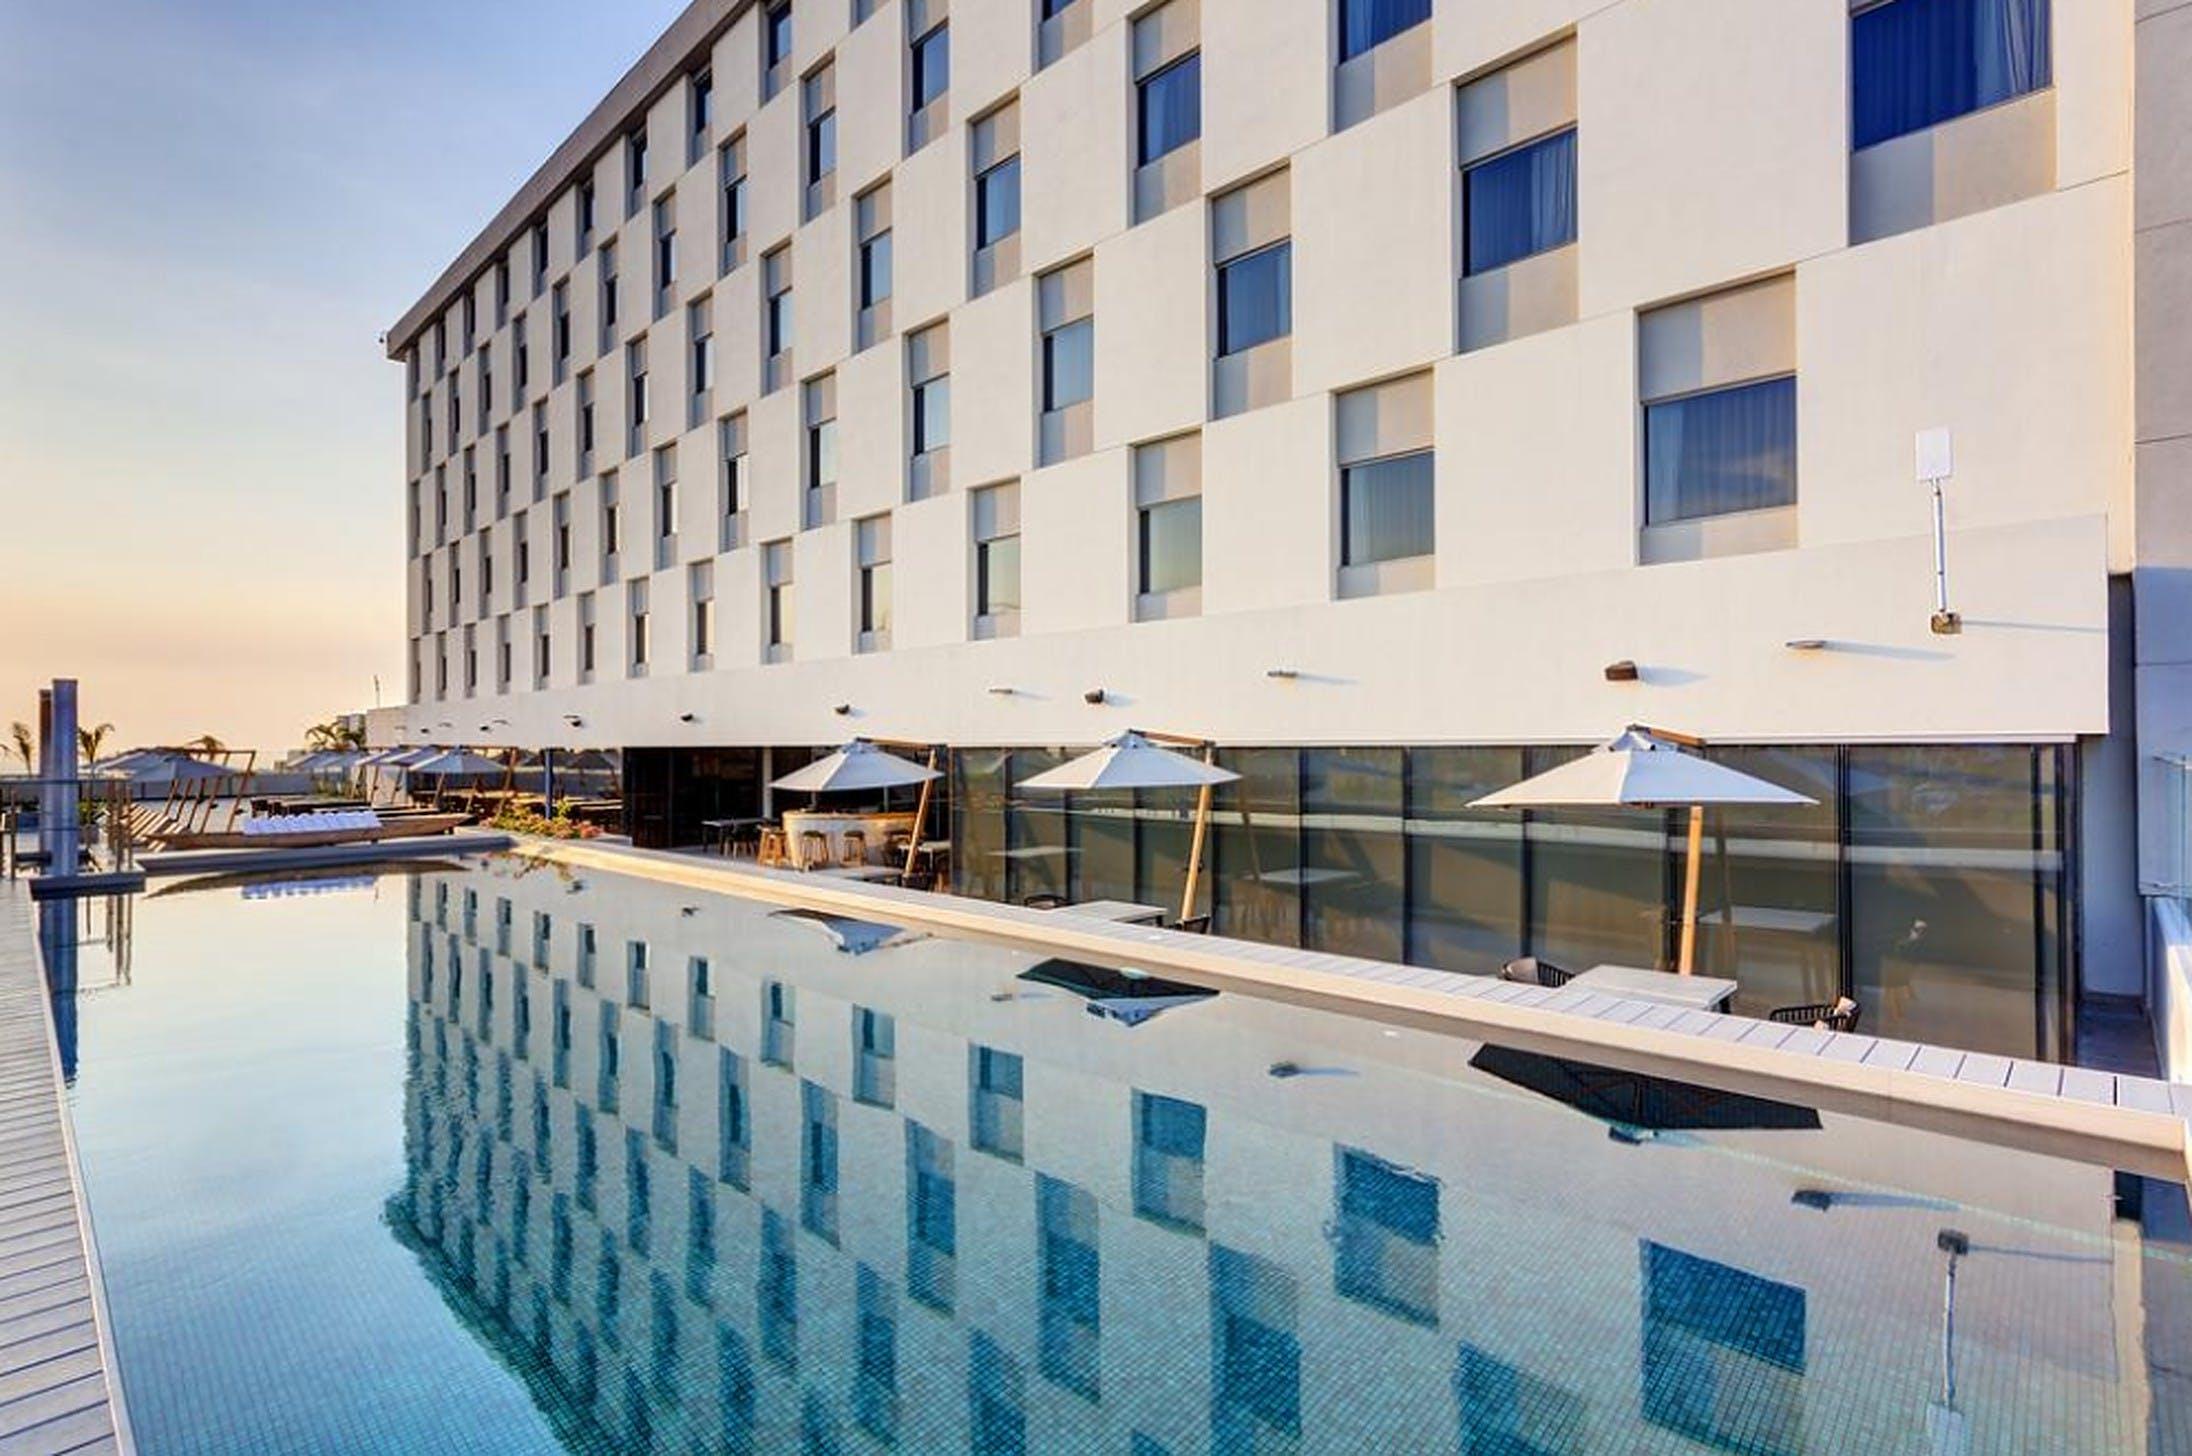 150 Residents | Buenavista | Upscale Designed Complex w/ Coworking + Pool